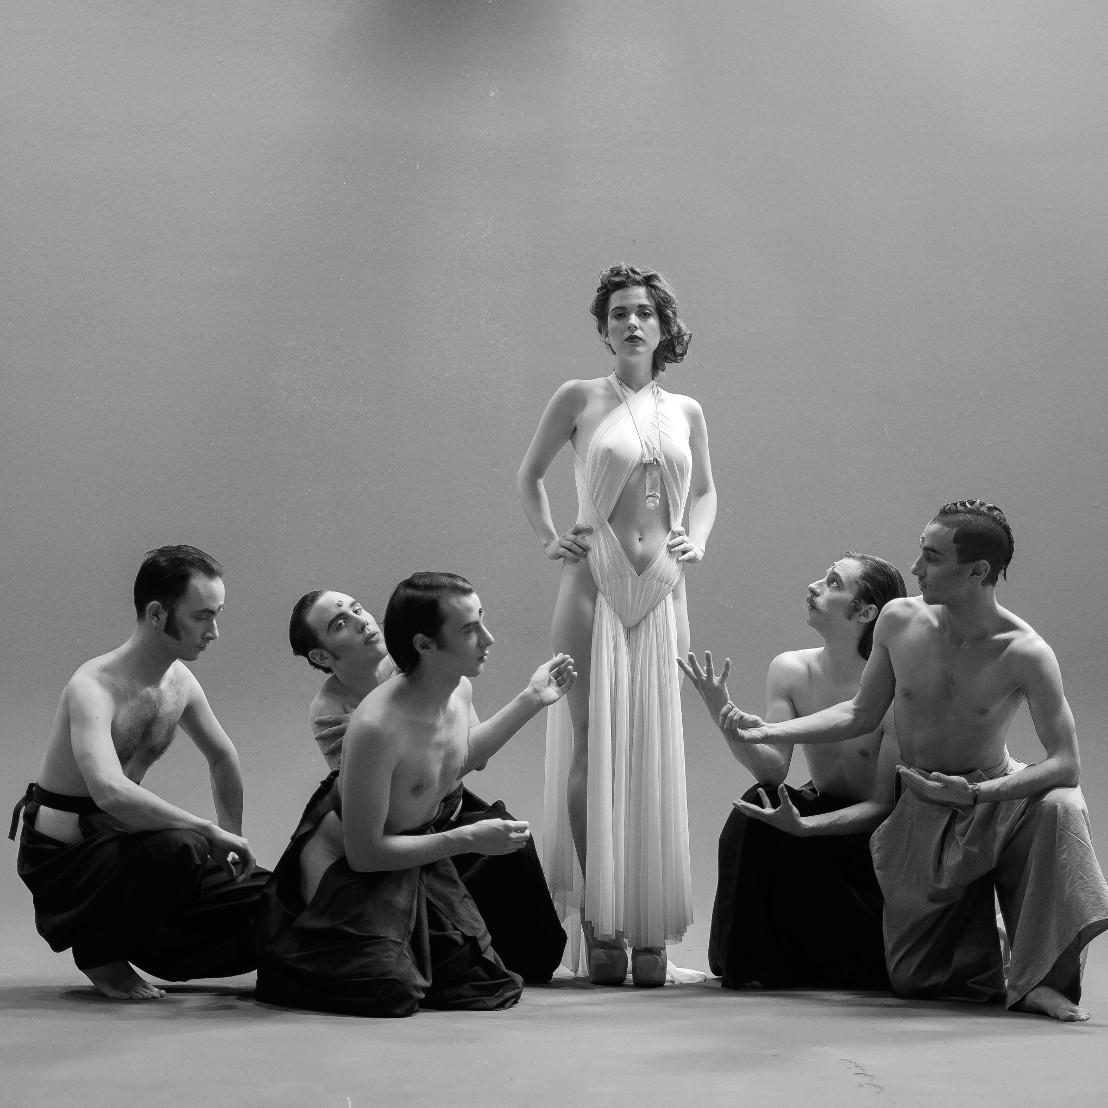 NEWS: La Femme to release new album 'Mystère' in September